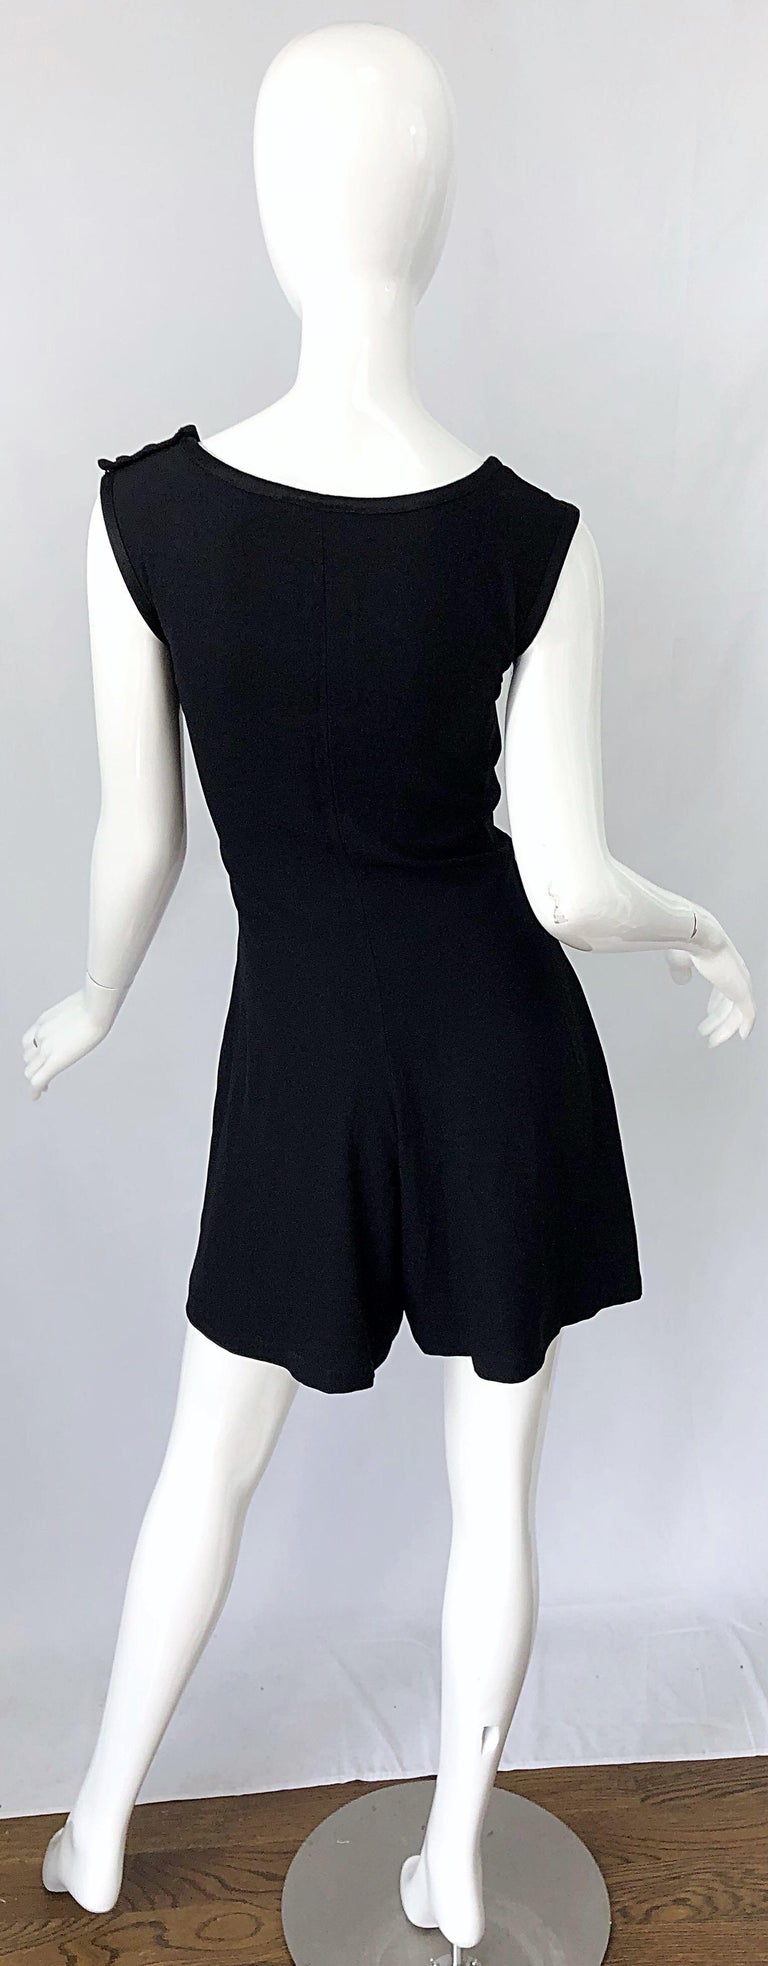 Women's  Vintage Yves Saint Laurent Romper Black Rayon Sleeveless 1990s One Piece 90s  For Sale